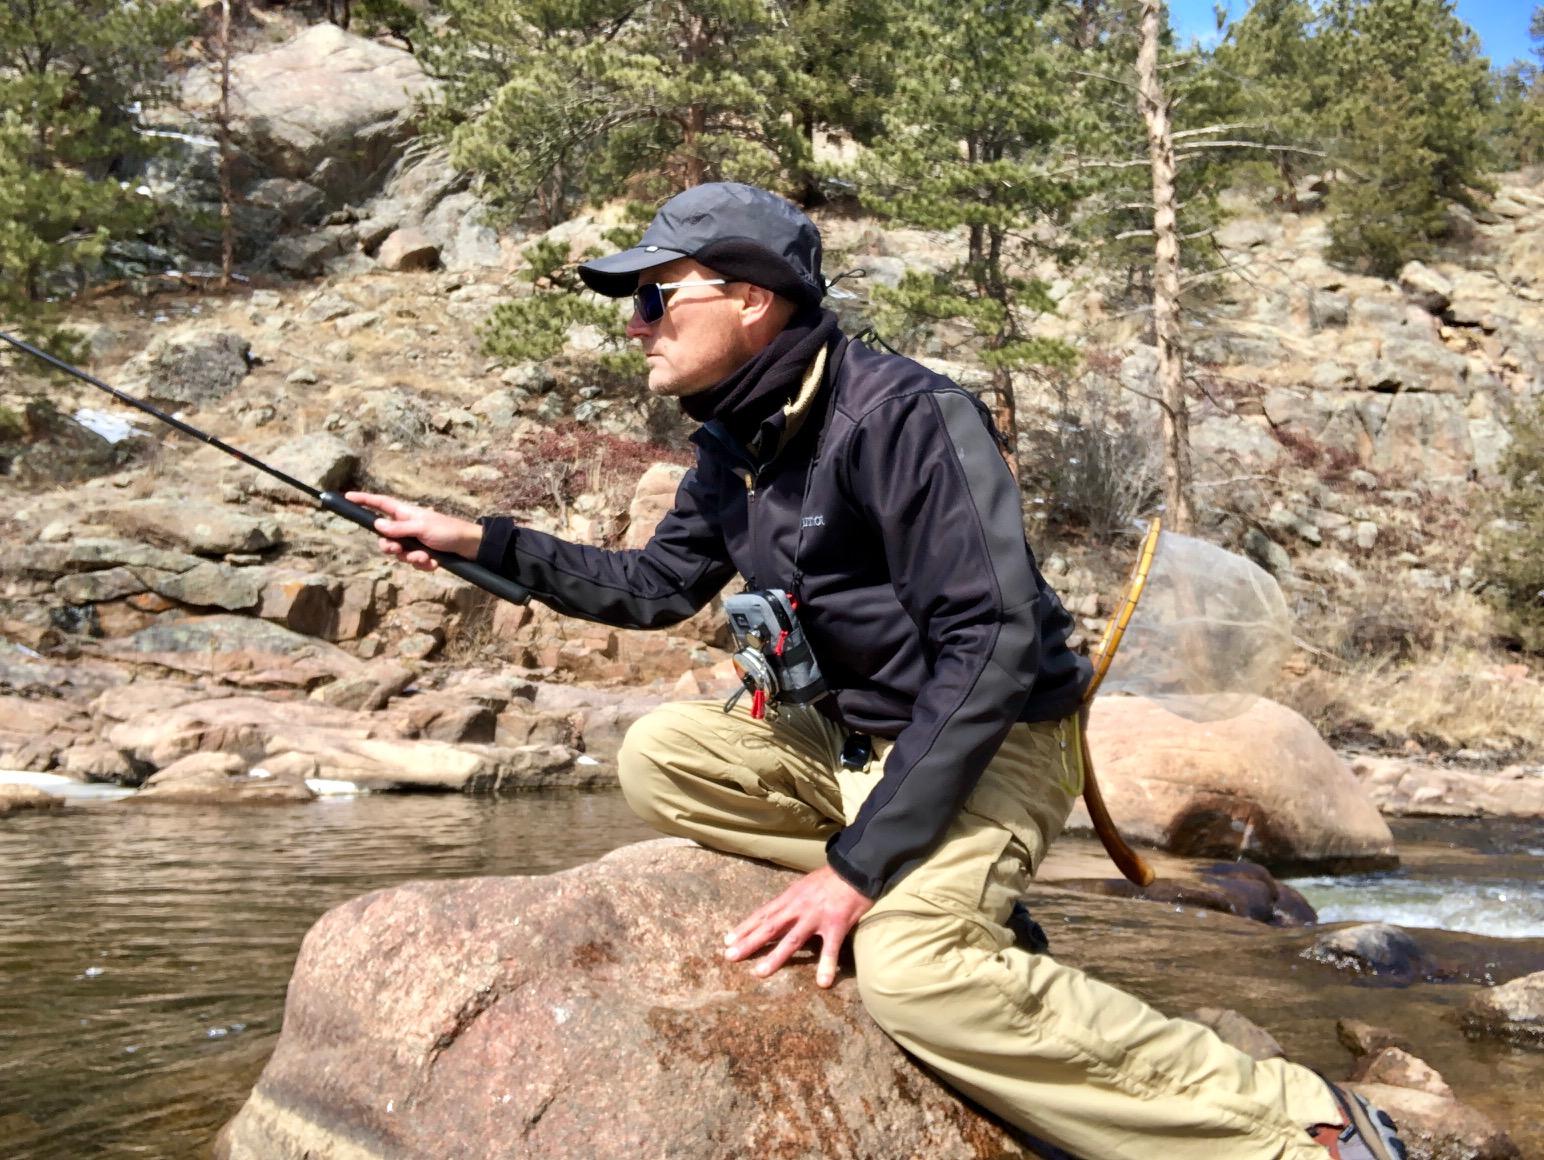 Jason Klass Tenkara Fishing on the St. Vrain